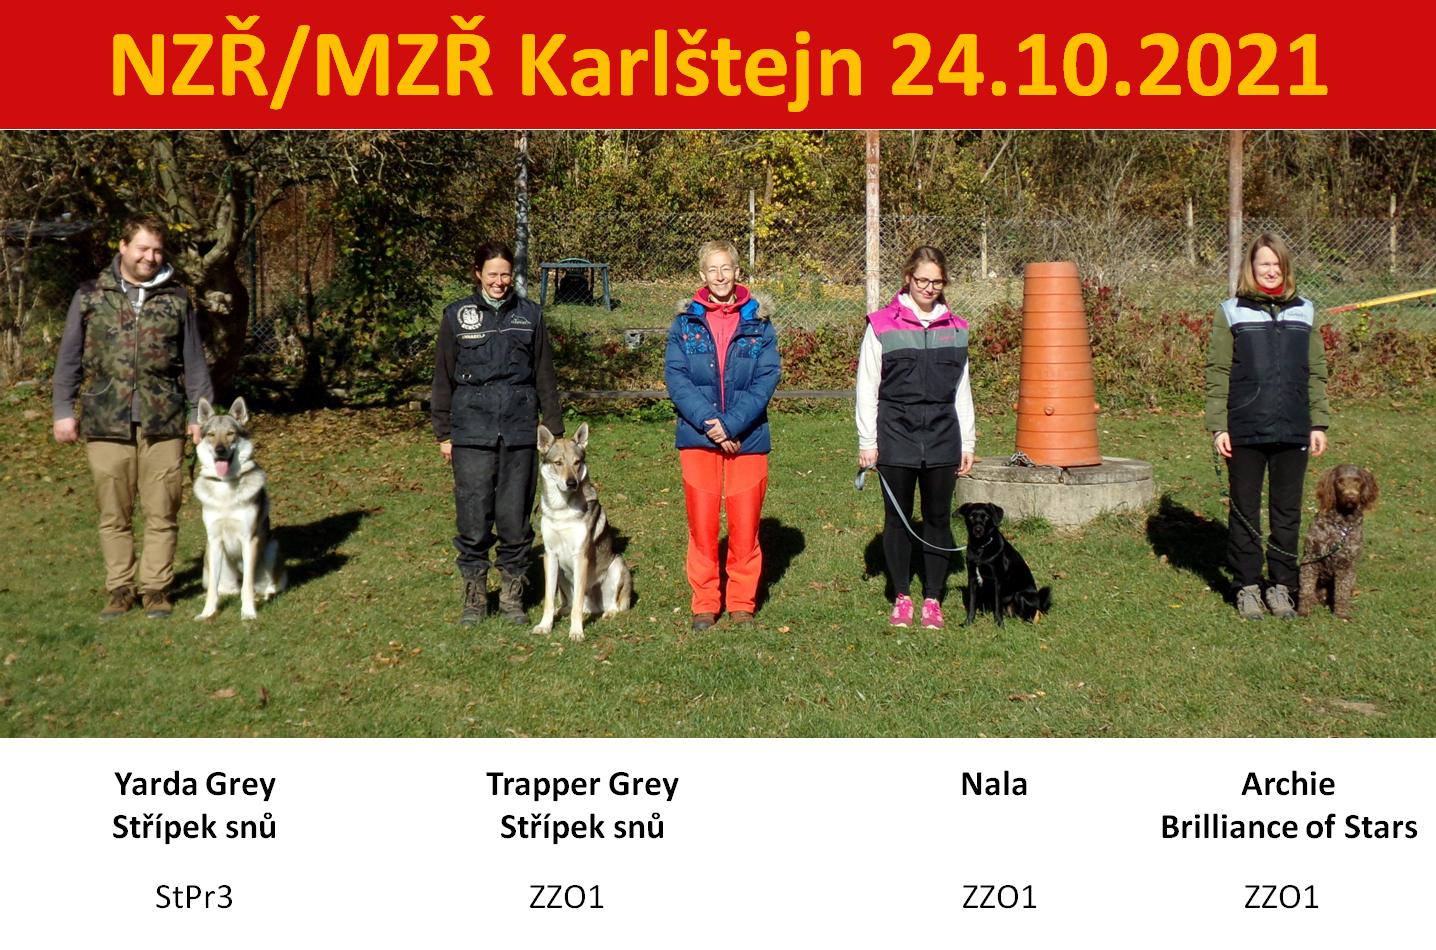 zk24-10-21